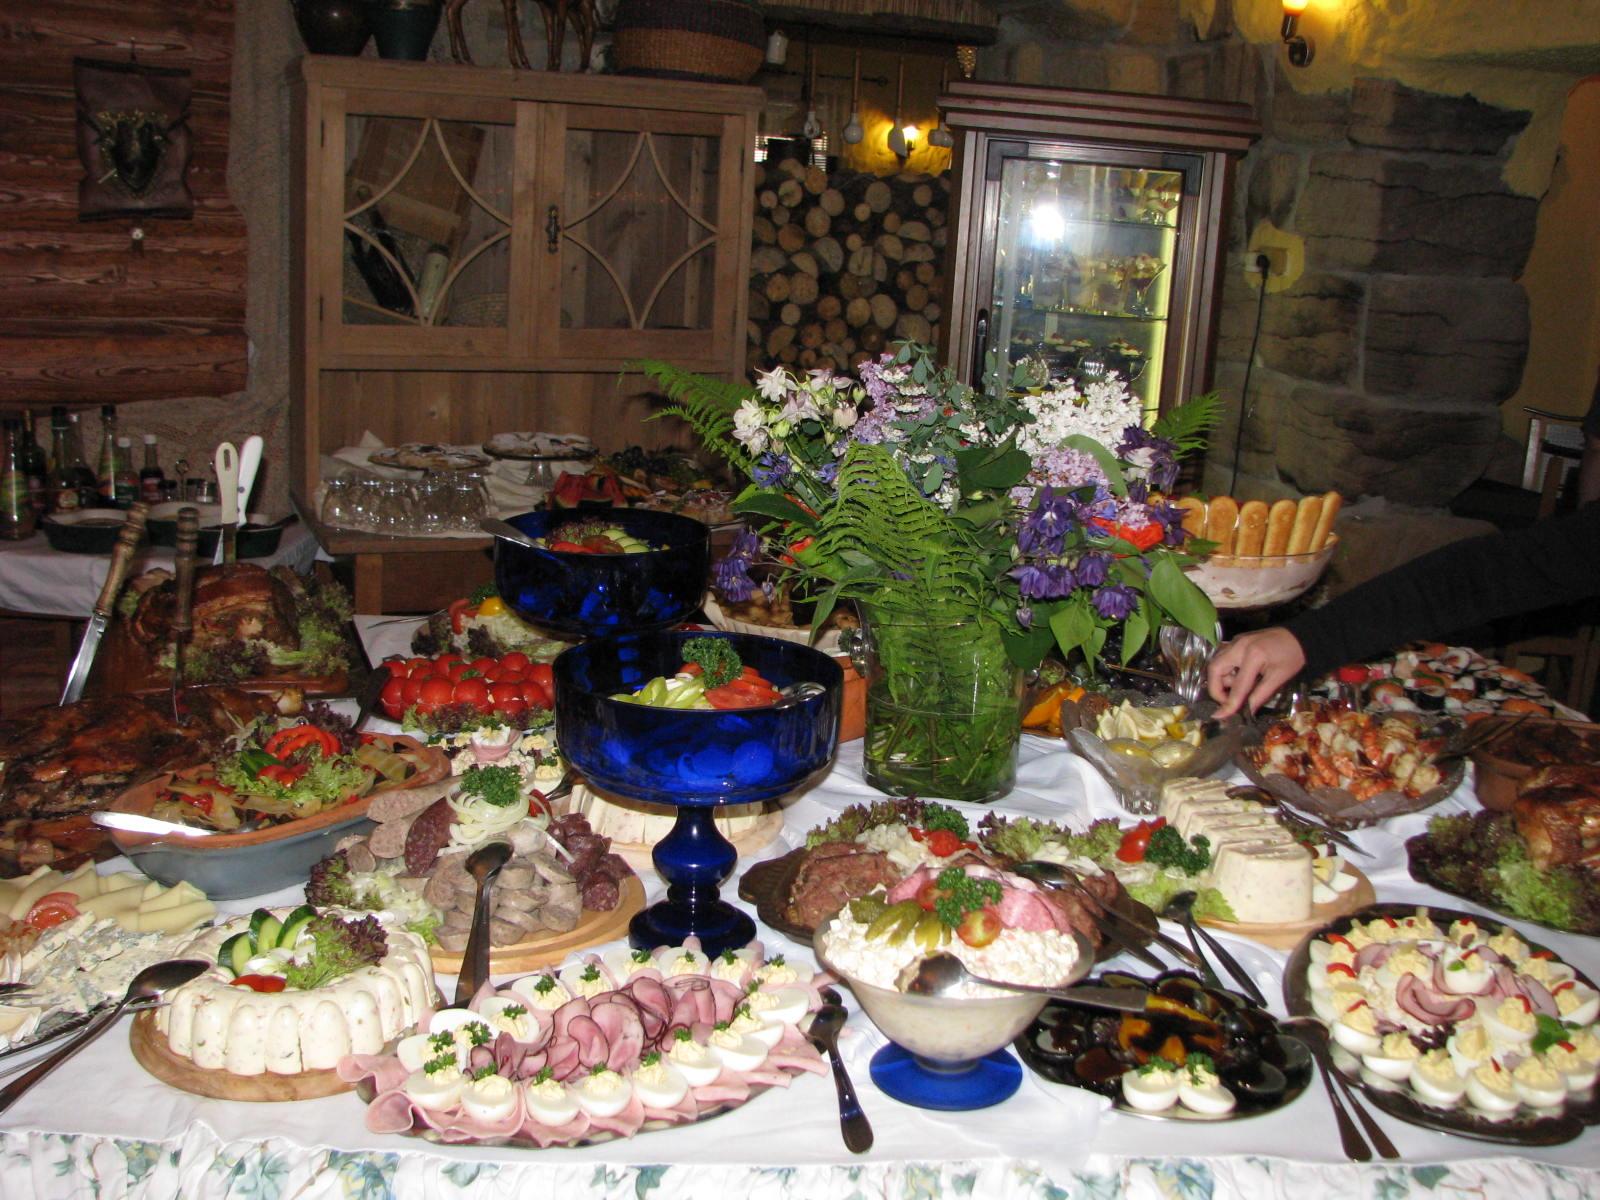 Restaurace Sklípek - rauty v penzionu U Duba, Liberecko